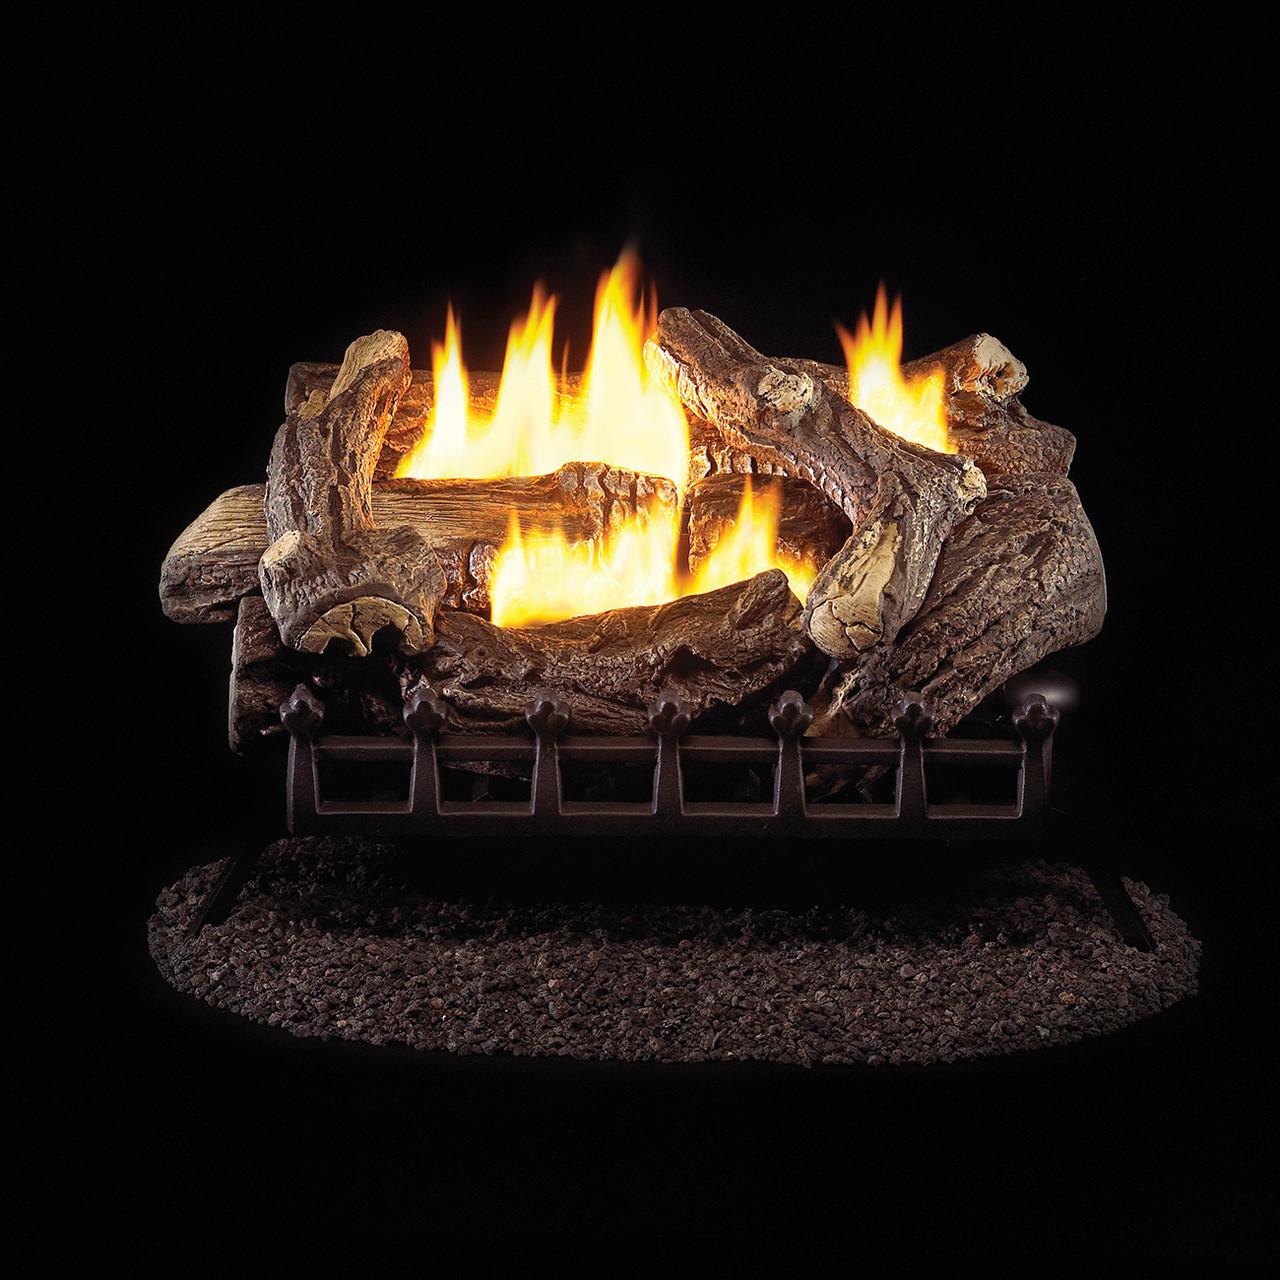 Procom Ventless Natural Gas Log Set 24in 34 000 Btu Millivolt Control Model Wzn24mva Factory Buys Direct